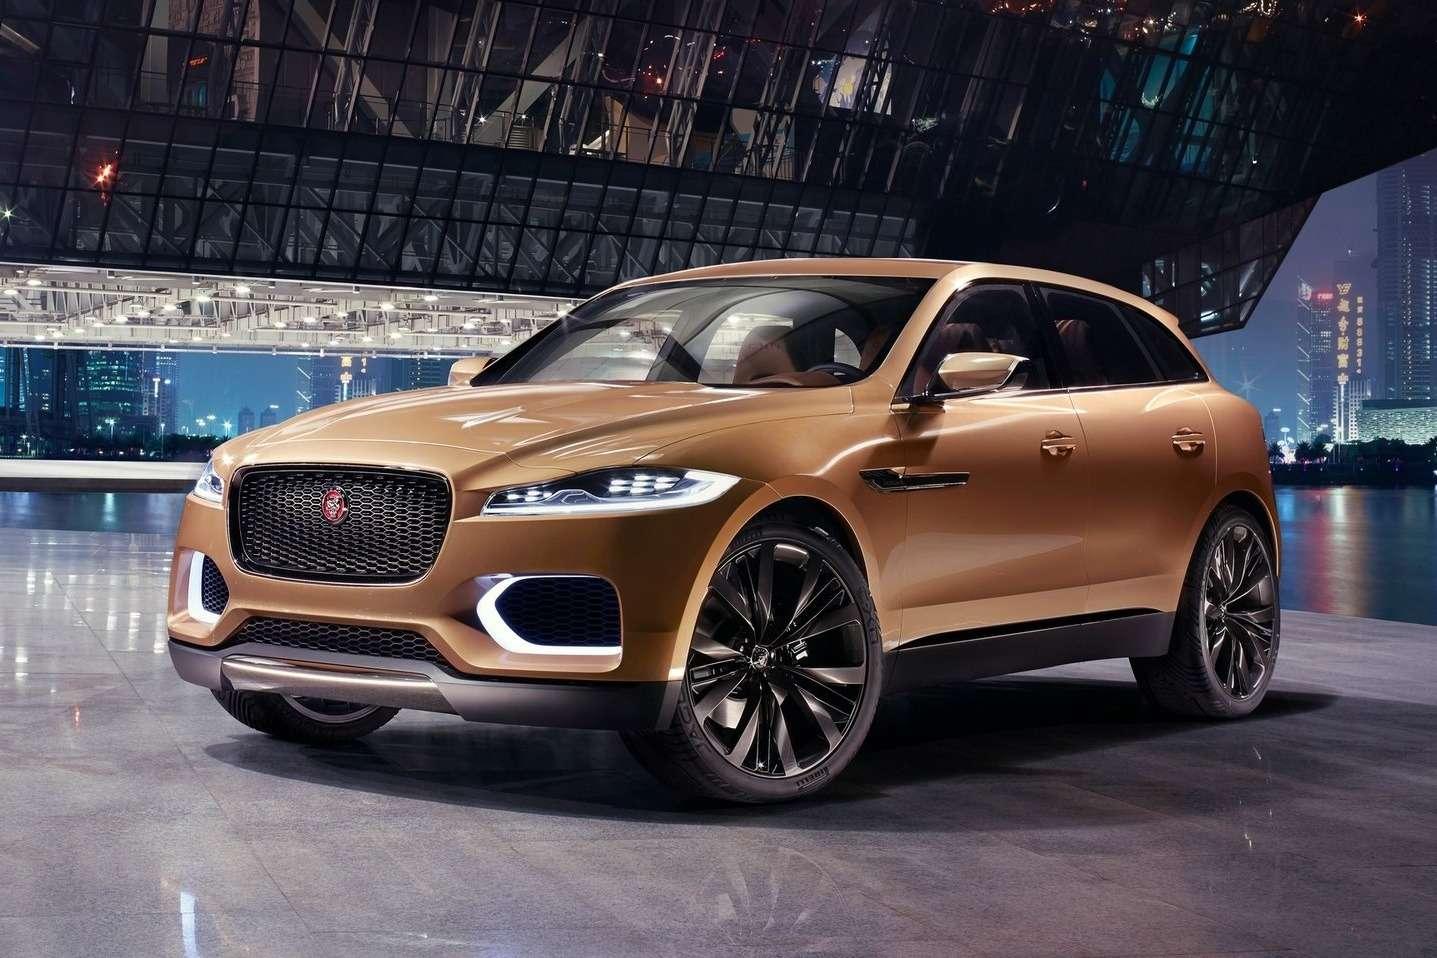 Jaguar-C-X17_5-Seater_Concept_2013_1600x1200_wallpaper_01